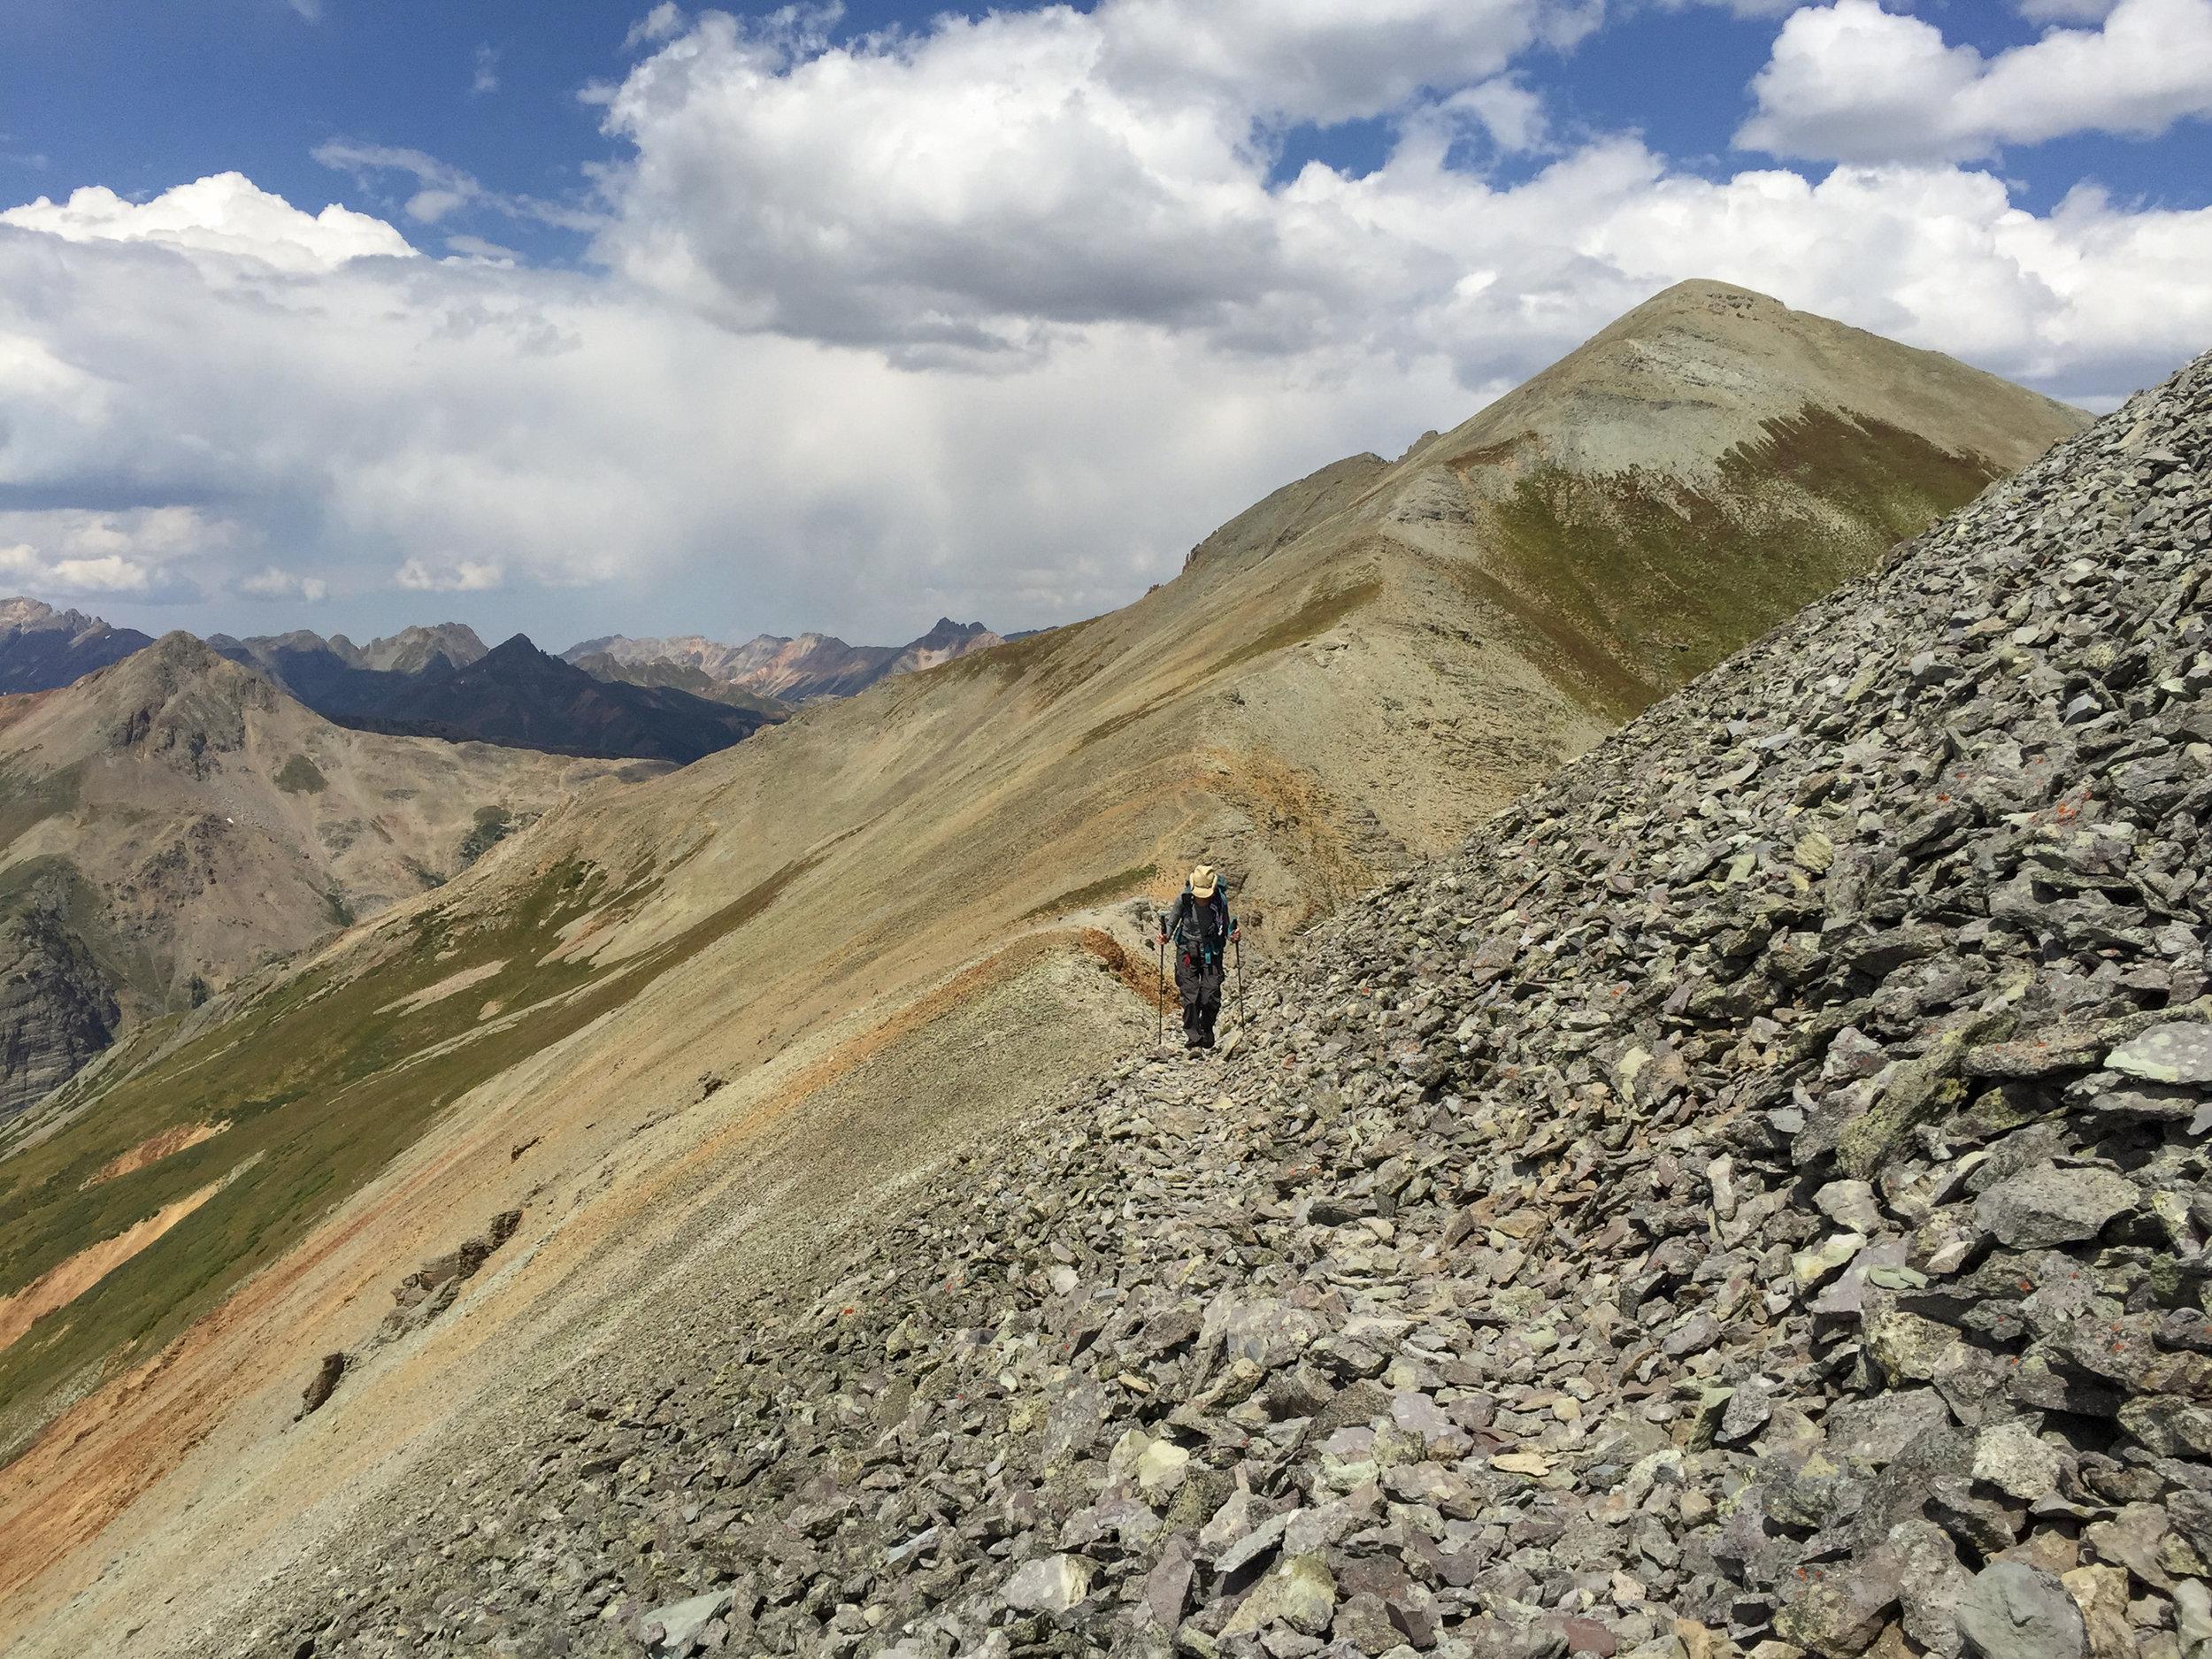 Penny on the narrow rocky trail